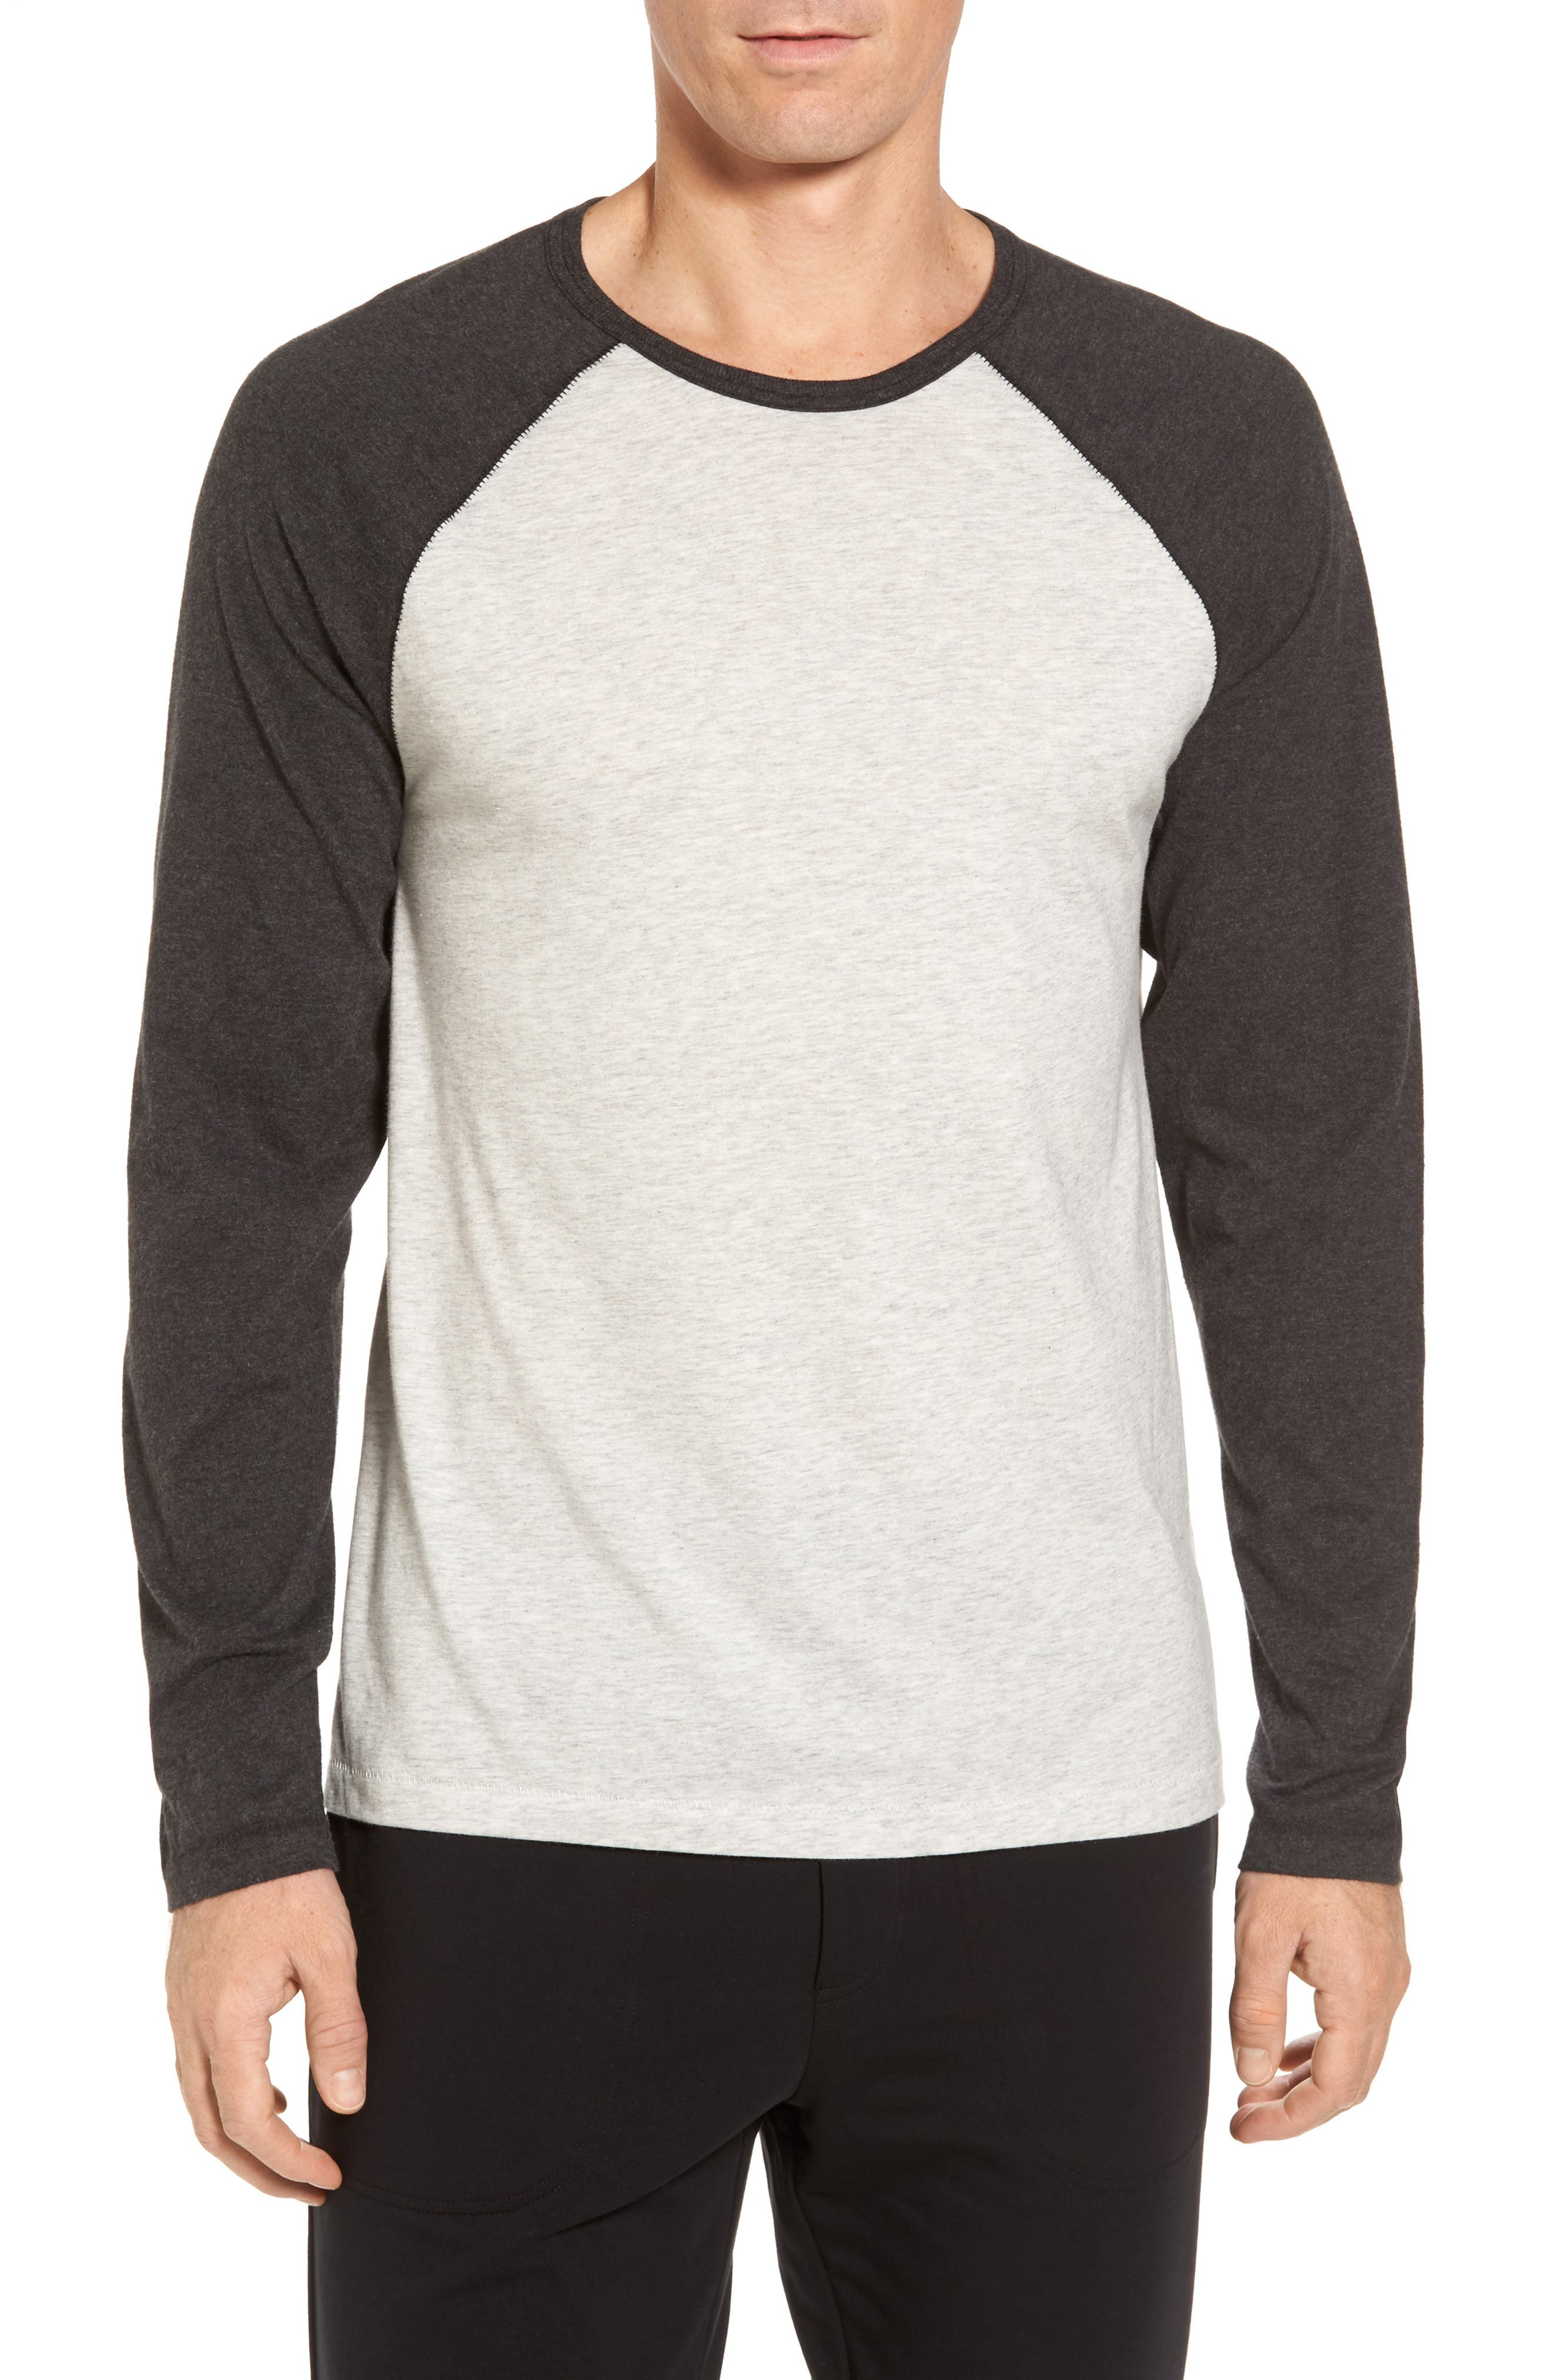 Stefan Raglan T-Shirt,                         Main,                         color, Seal Heather/ Black Bear